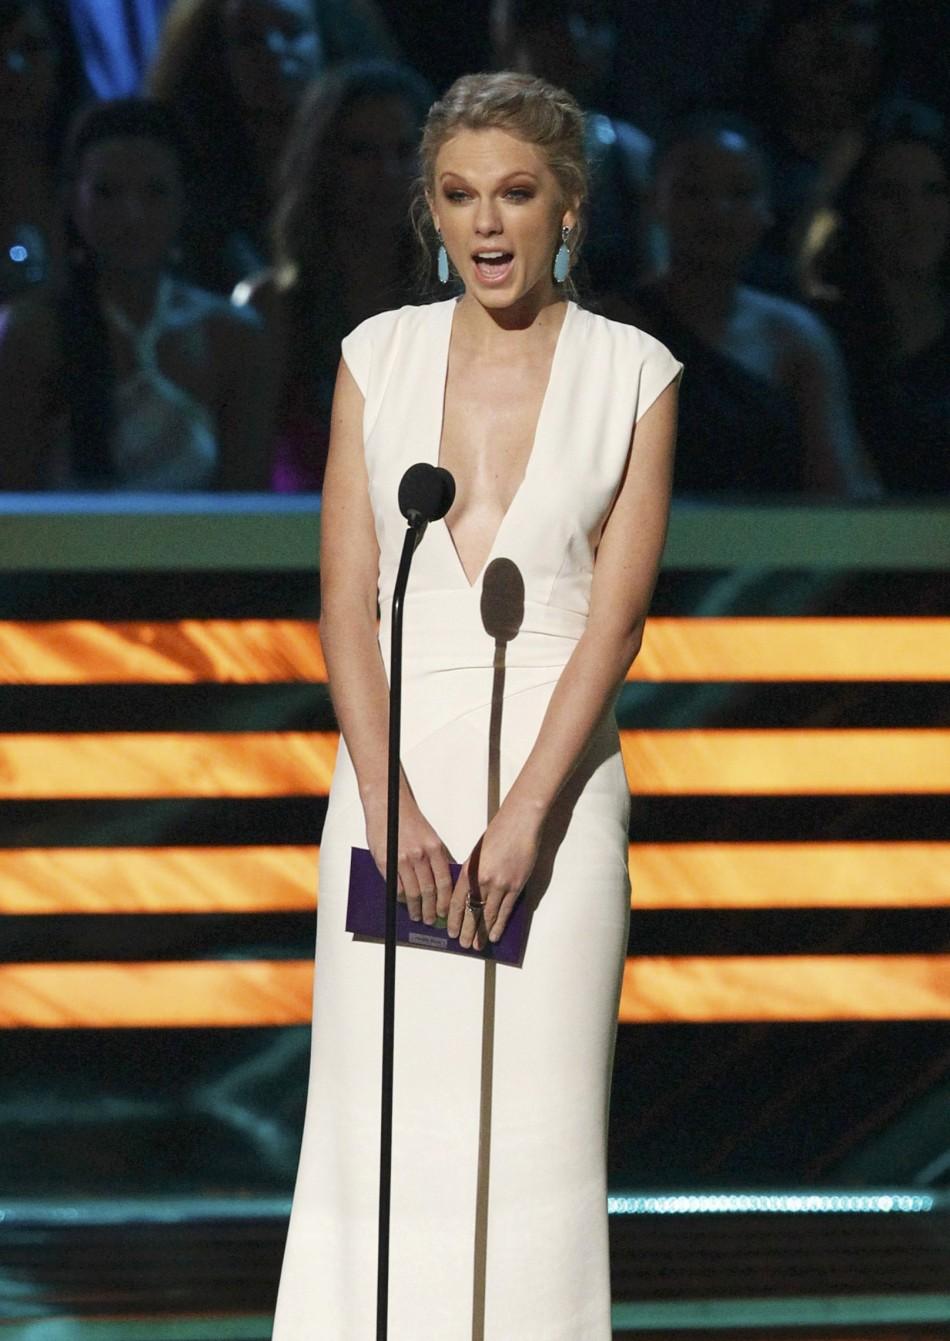 Taylor Swift Flaunts Major Cleavage at PCA